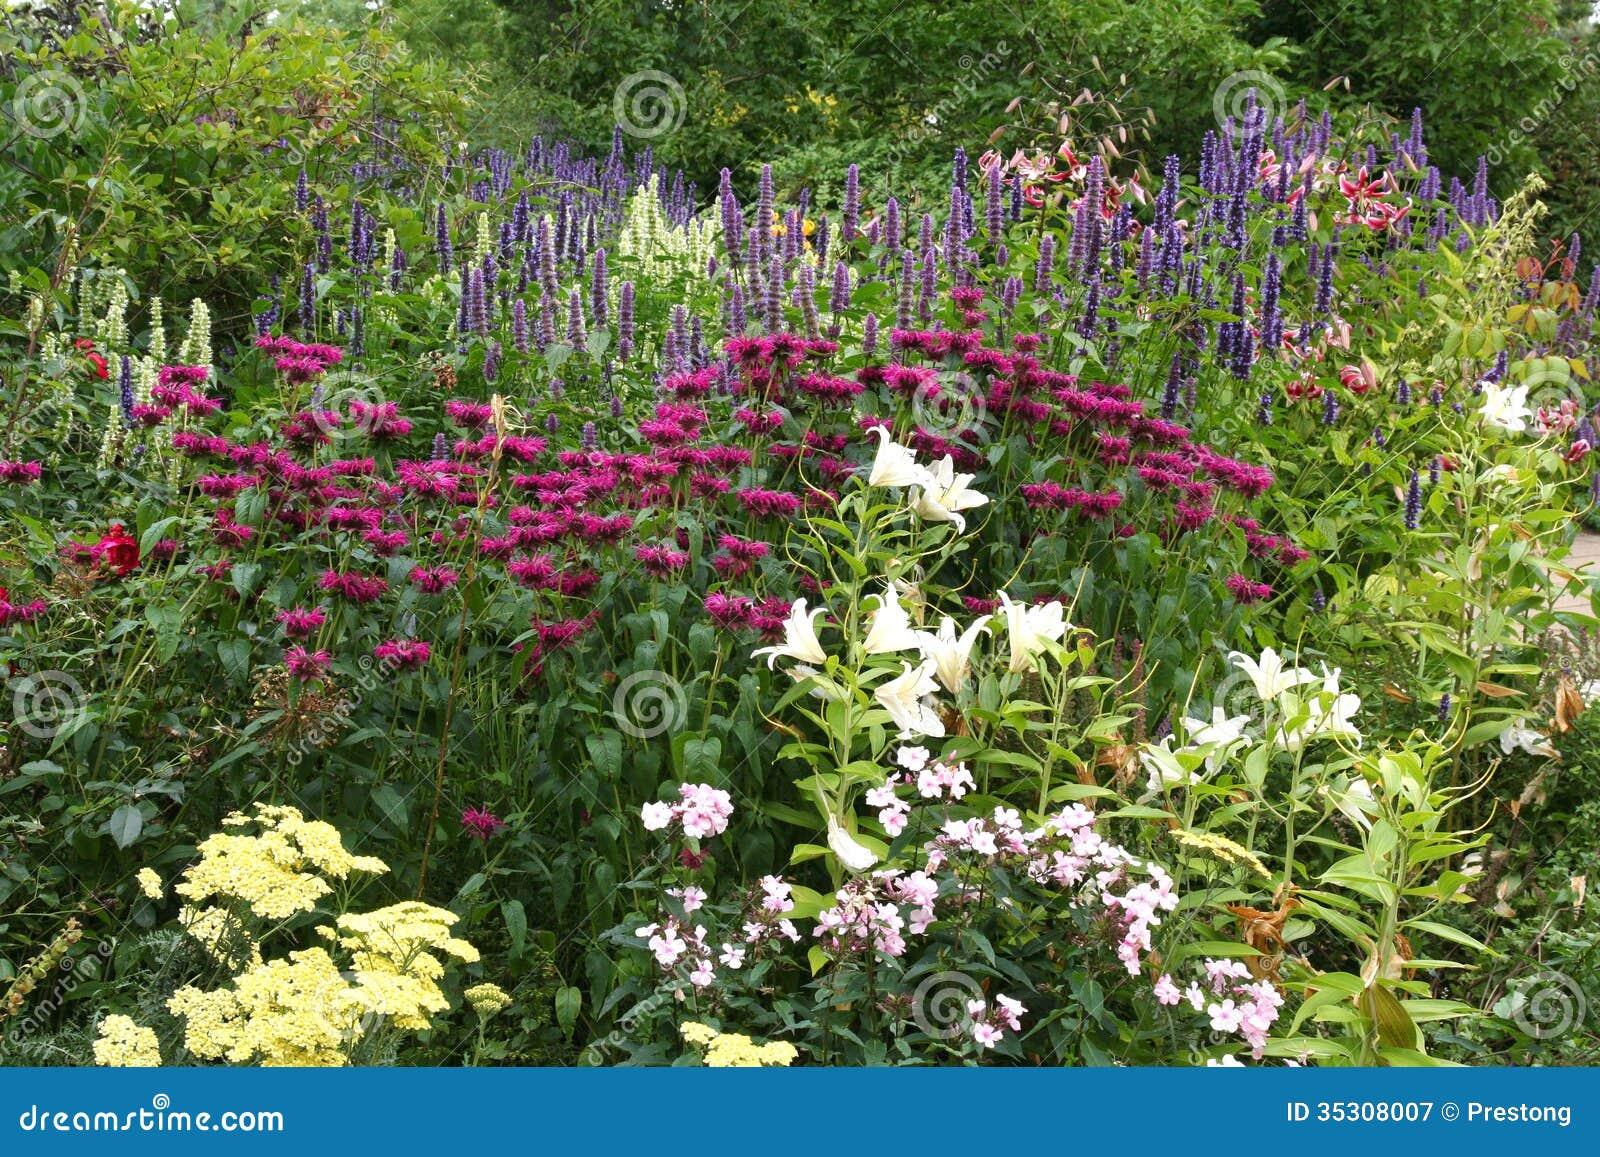 Floral Border In An English Garden Royalty Free Stock